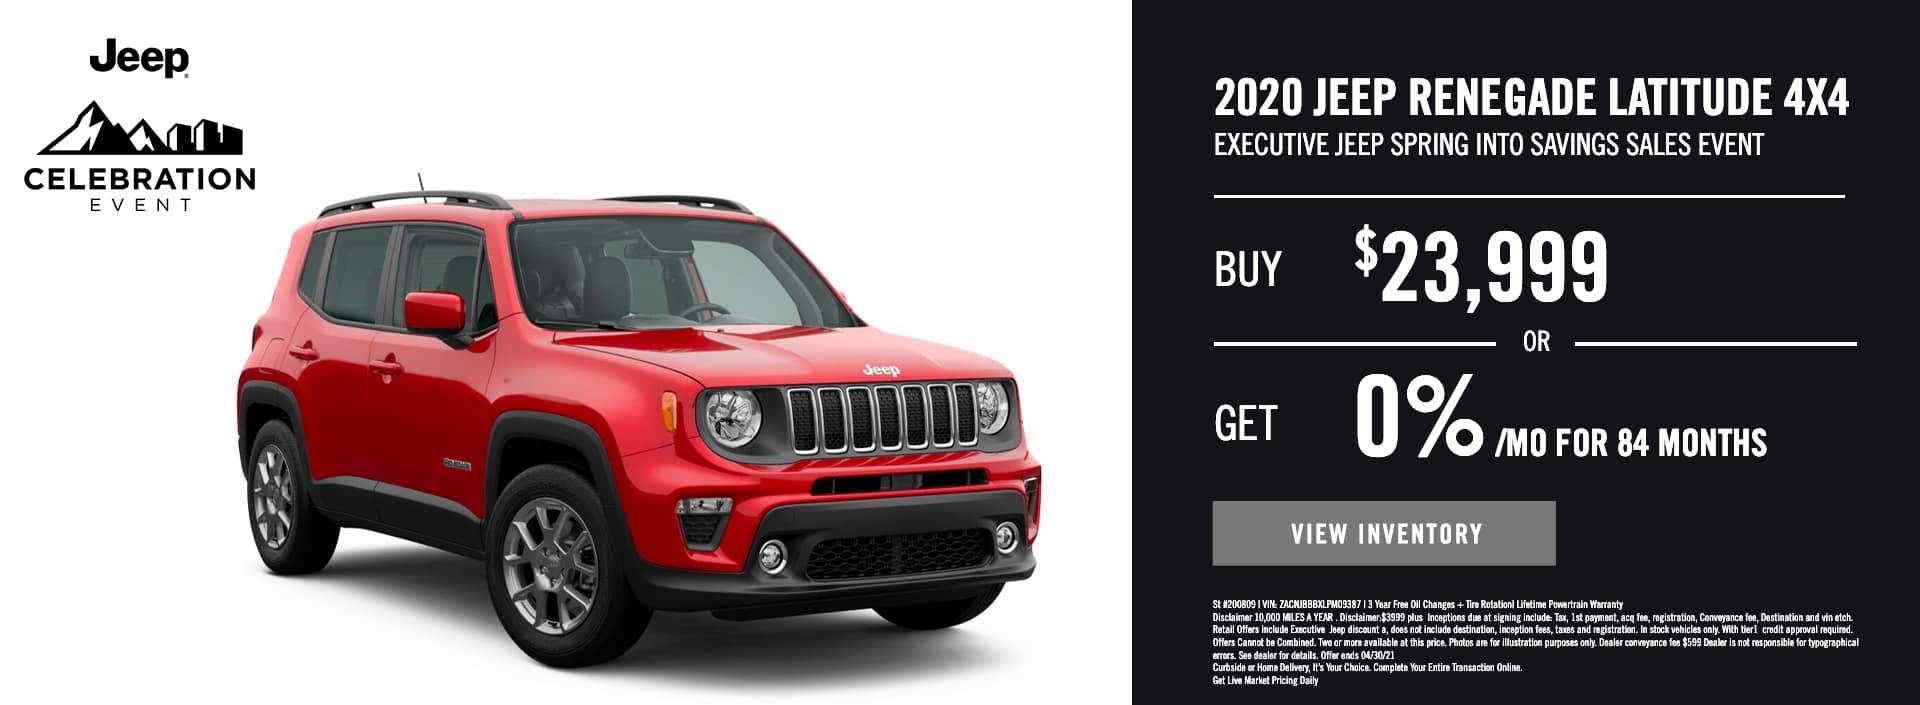 EAG_Jeep_2020 Jeep Renegade Latitude 4×4